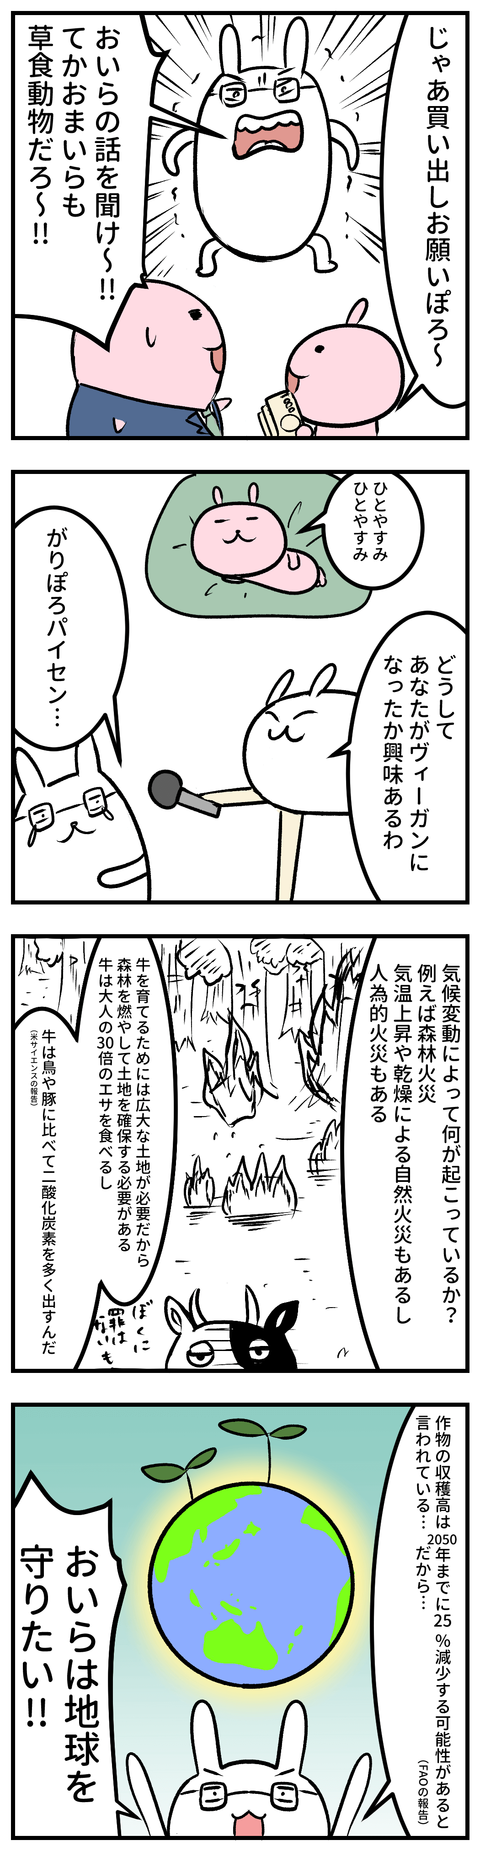 manga-yuzuporo17-1